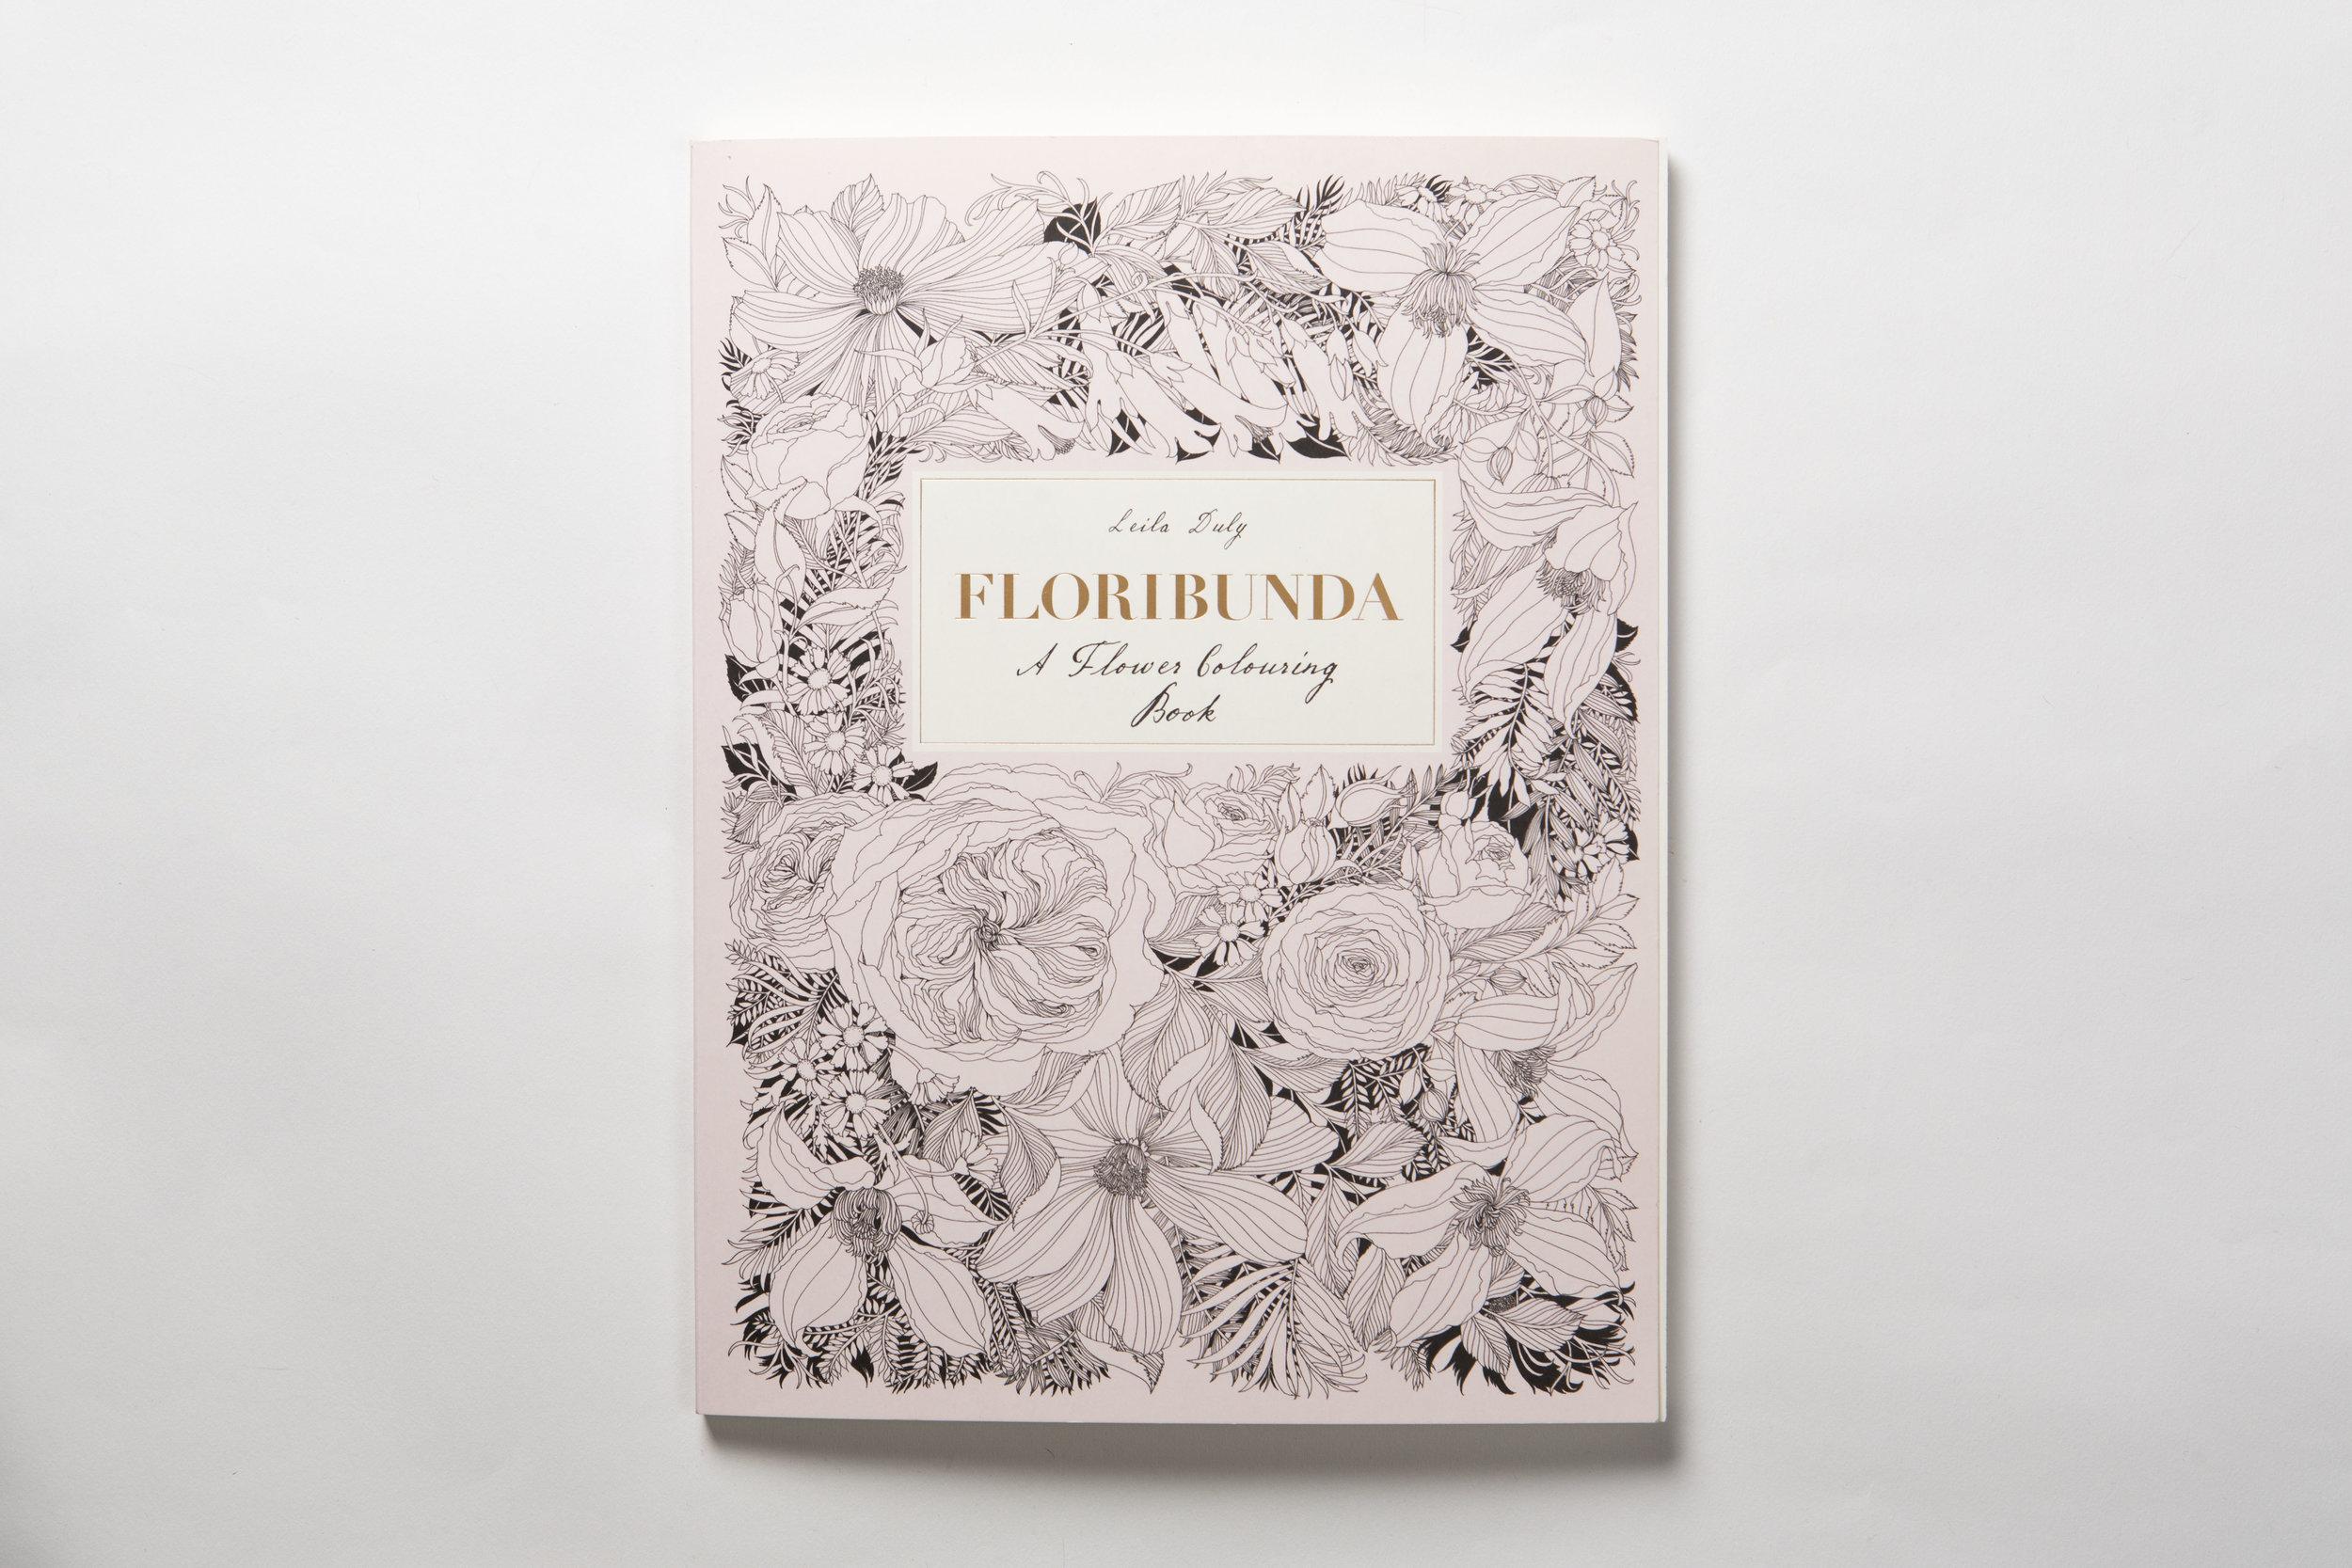 Bestselling Floribunda Colouring Book Published by Laurence King